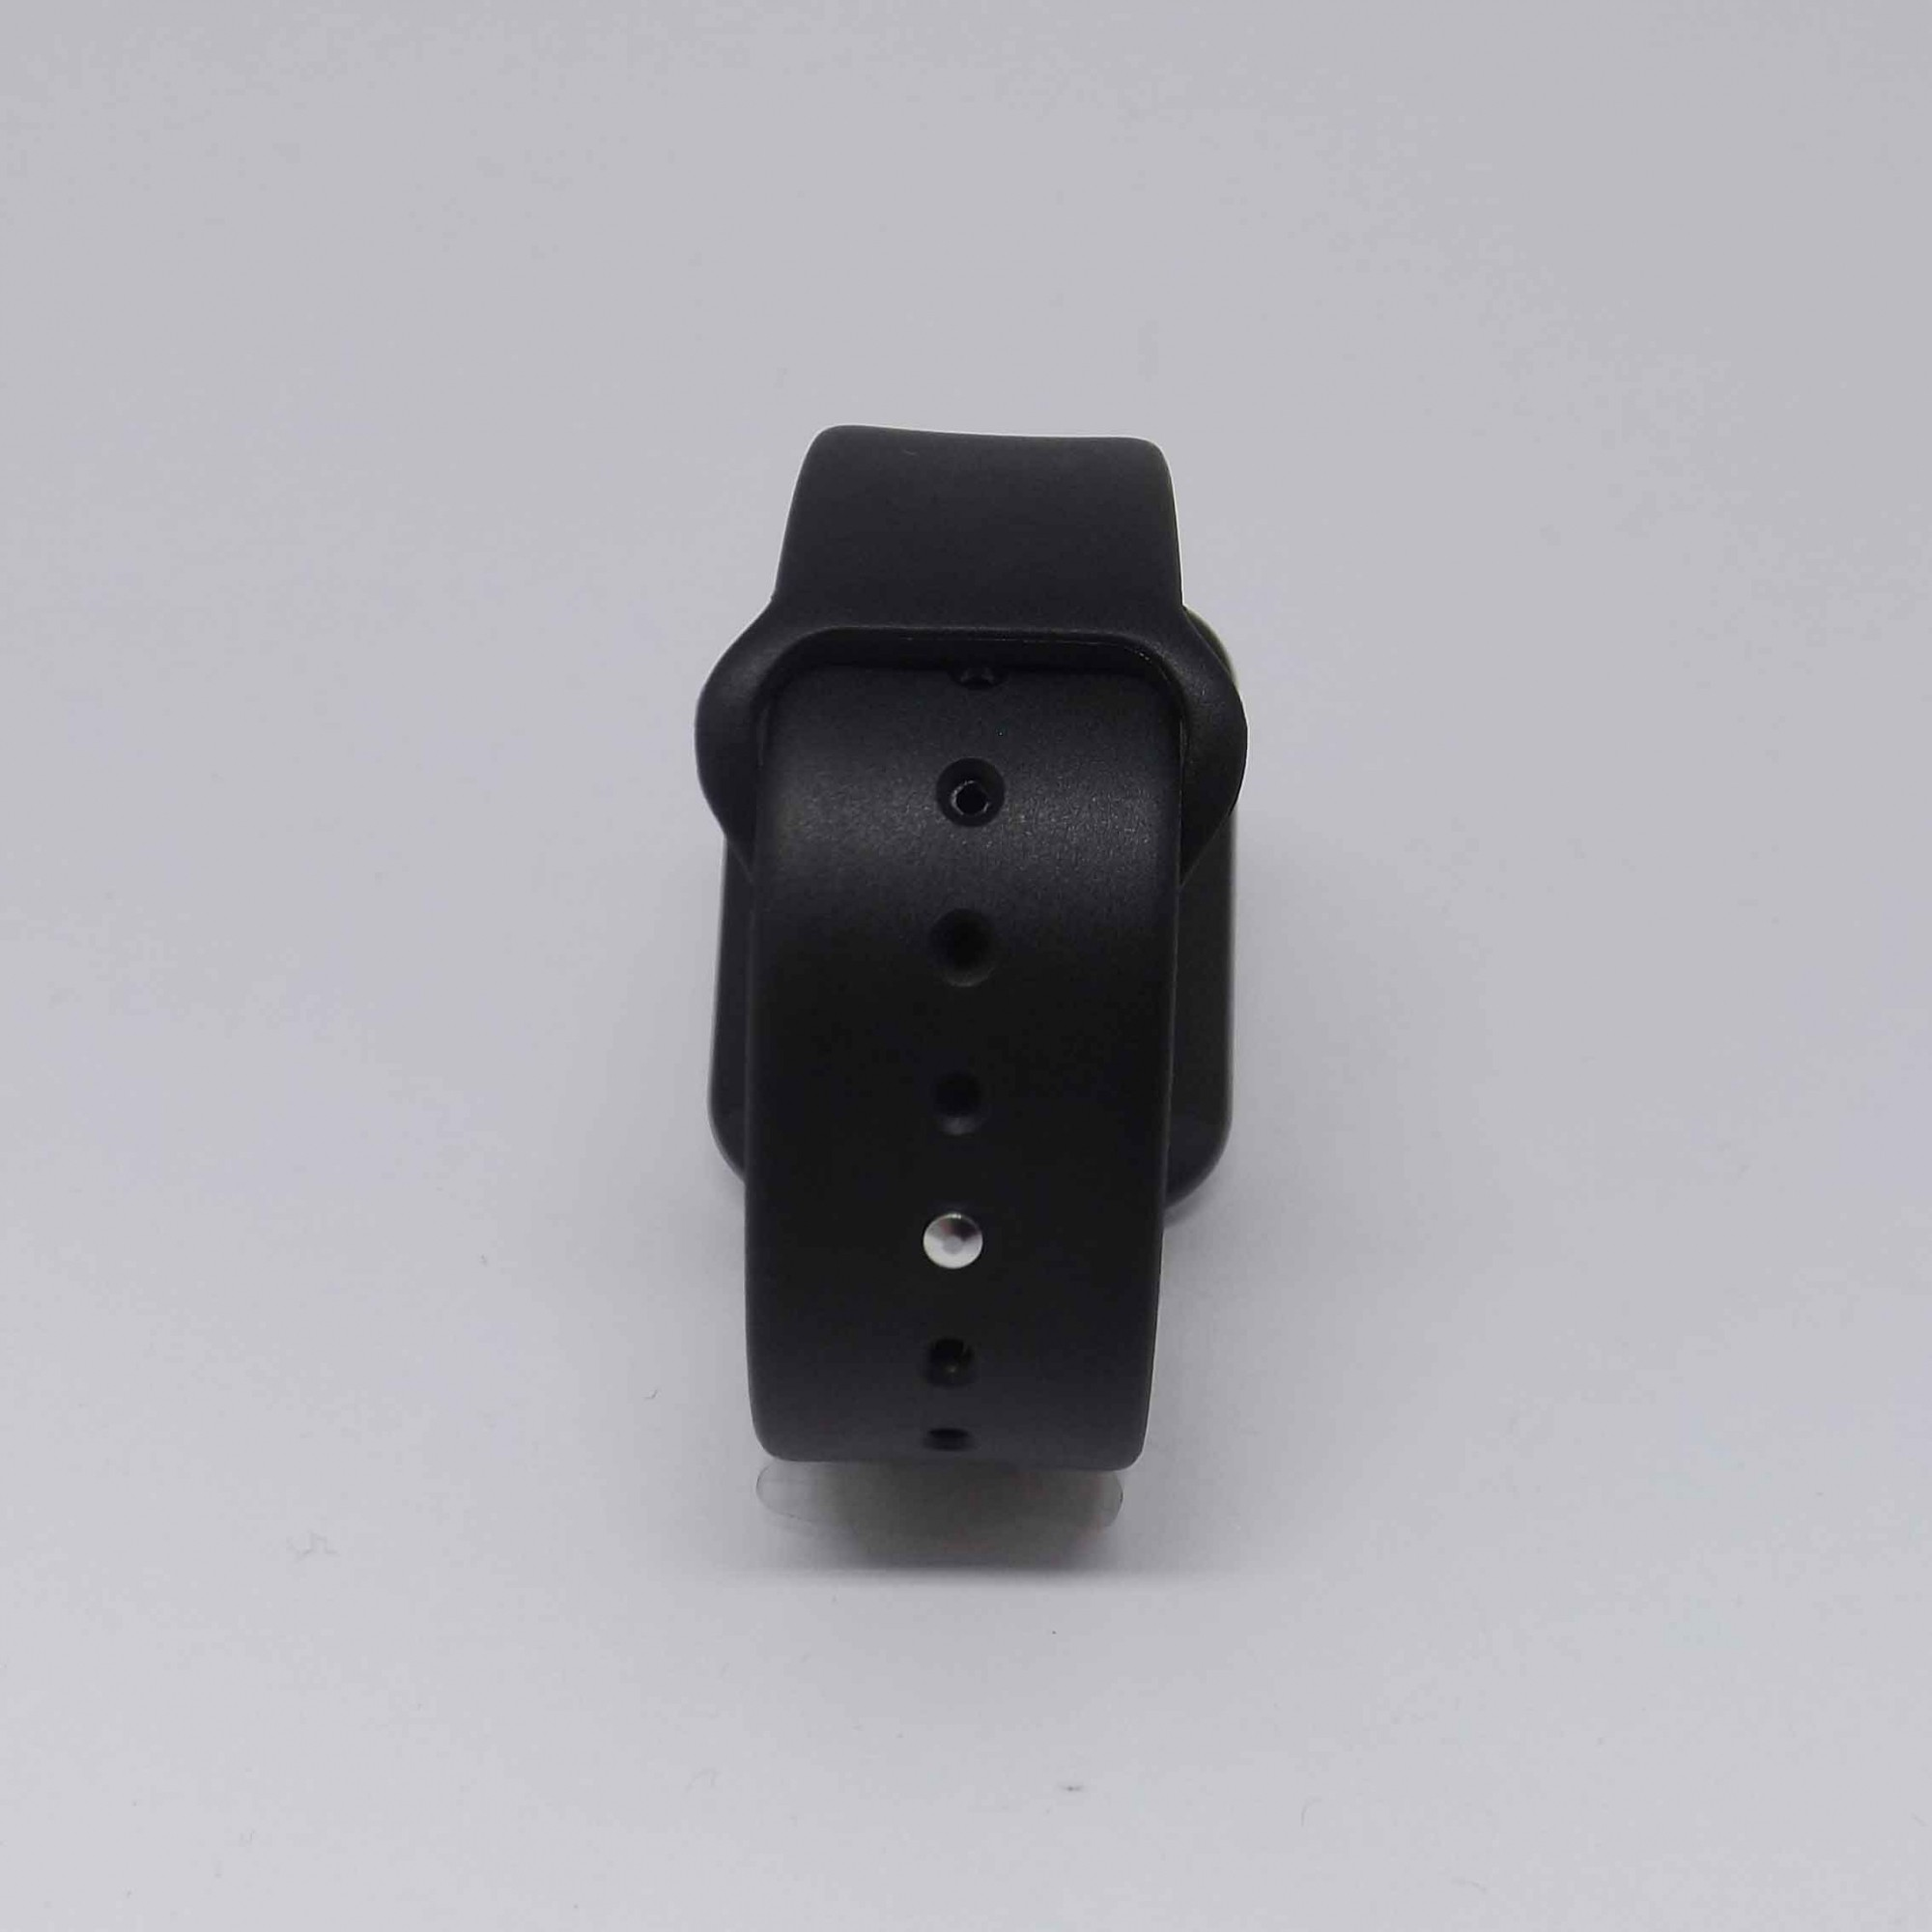 Smartch Watch B57